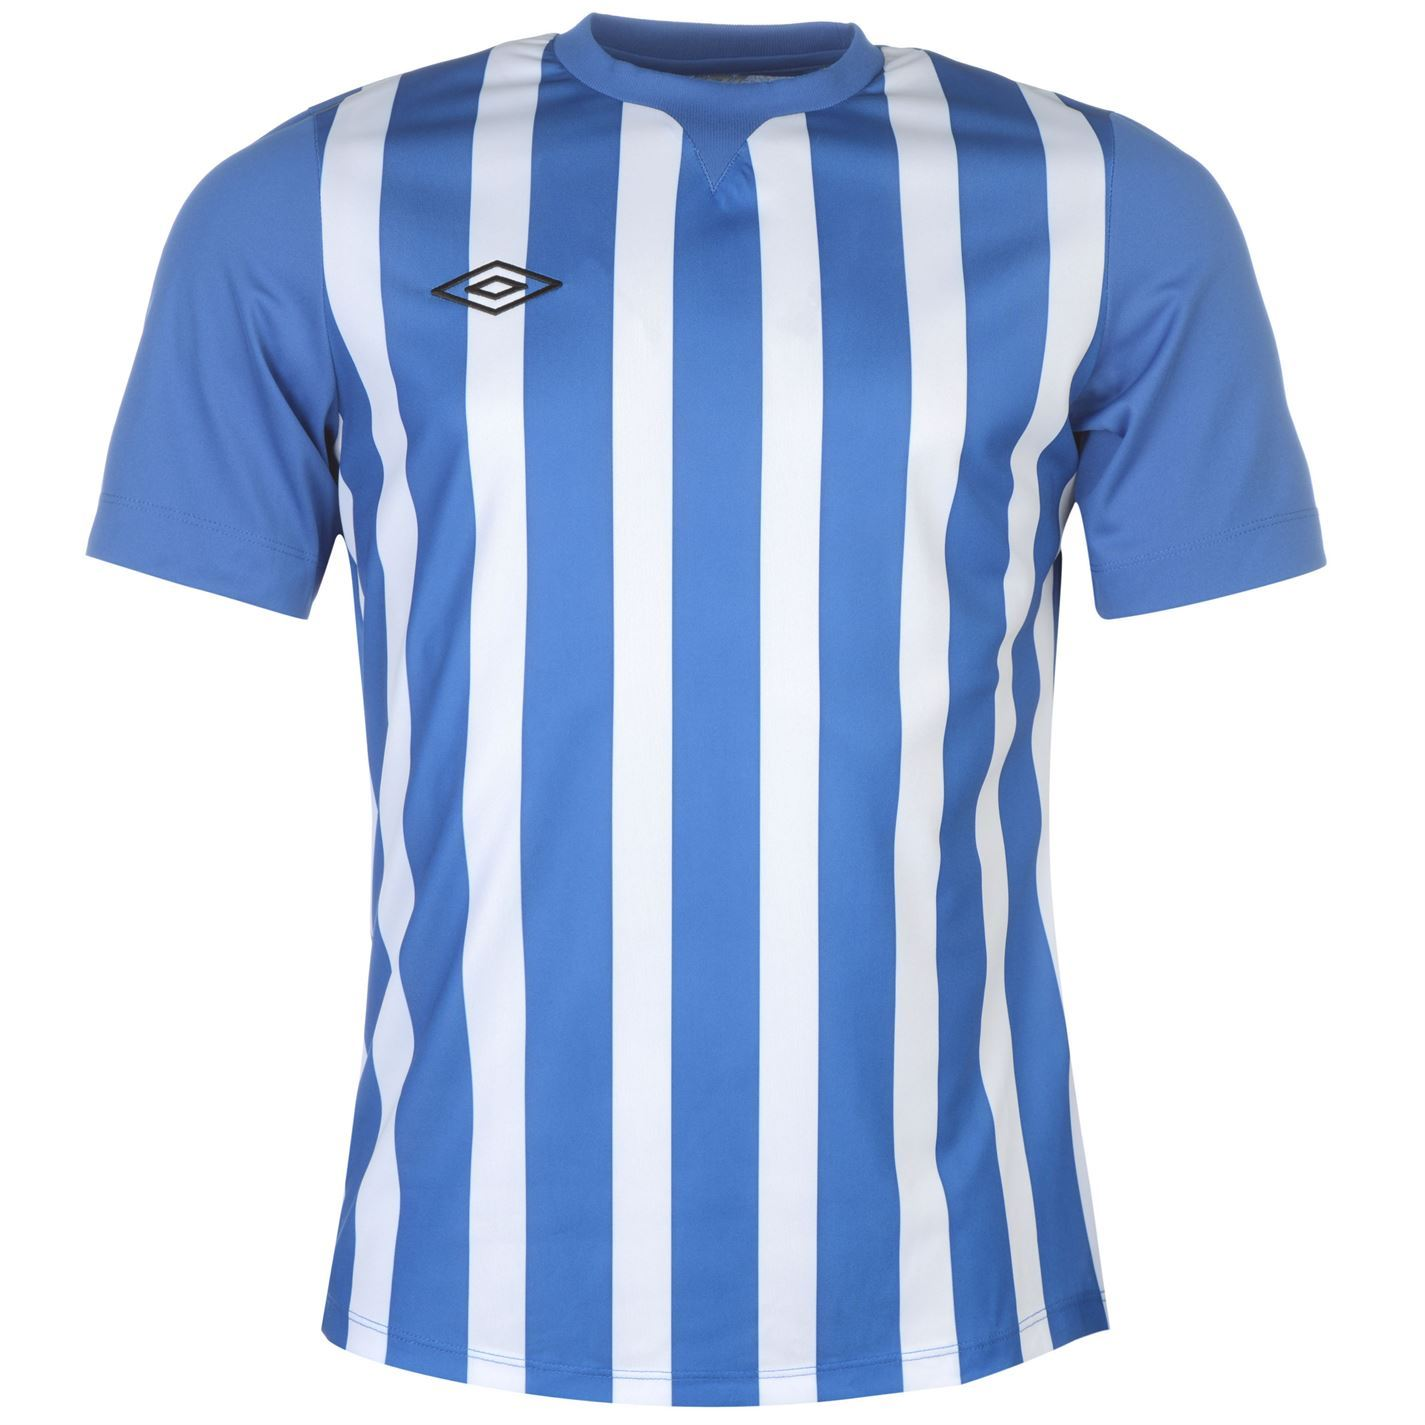 ... Umbro Stripe Training Jersey Mens Royal White Football Soccer Top  T-Shirt Shirt 38e9d4c5984e7